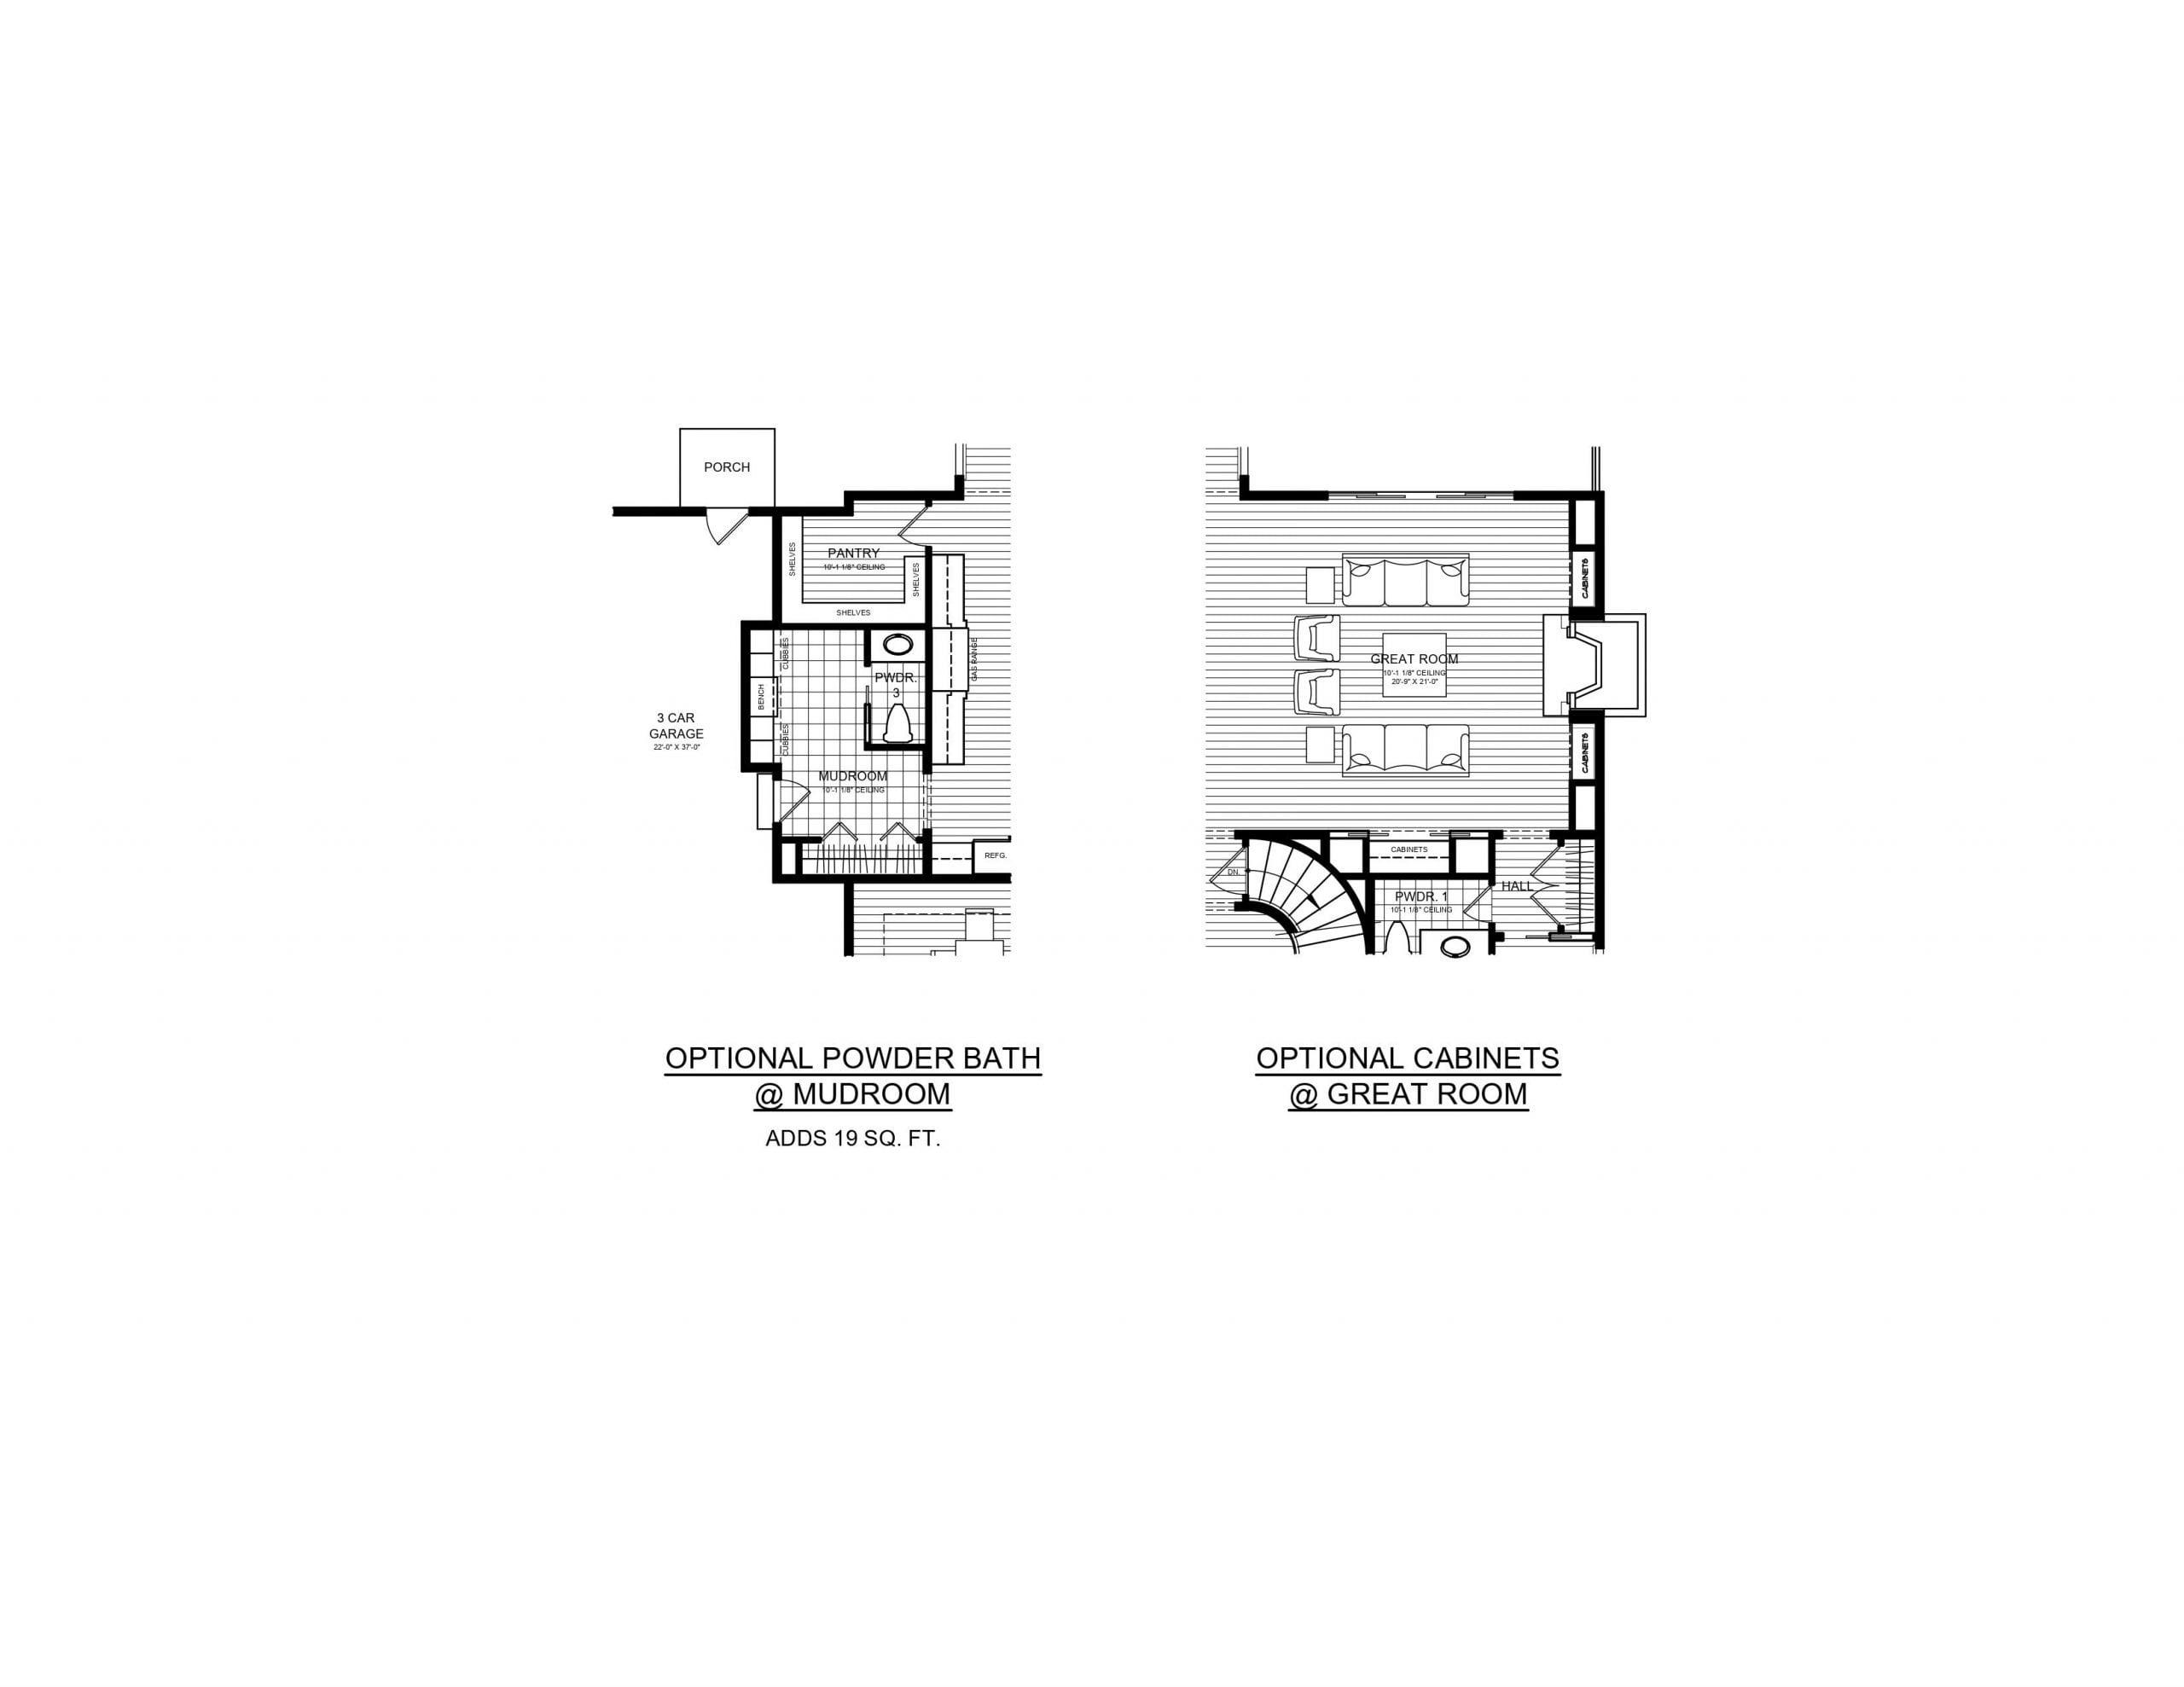 5 Wyndam Court - Optional powder bath and cabinets detail